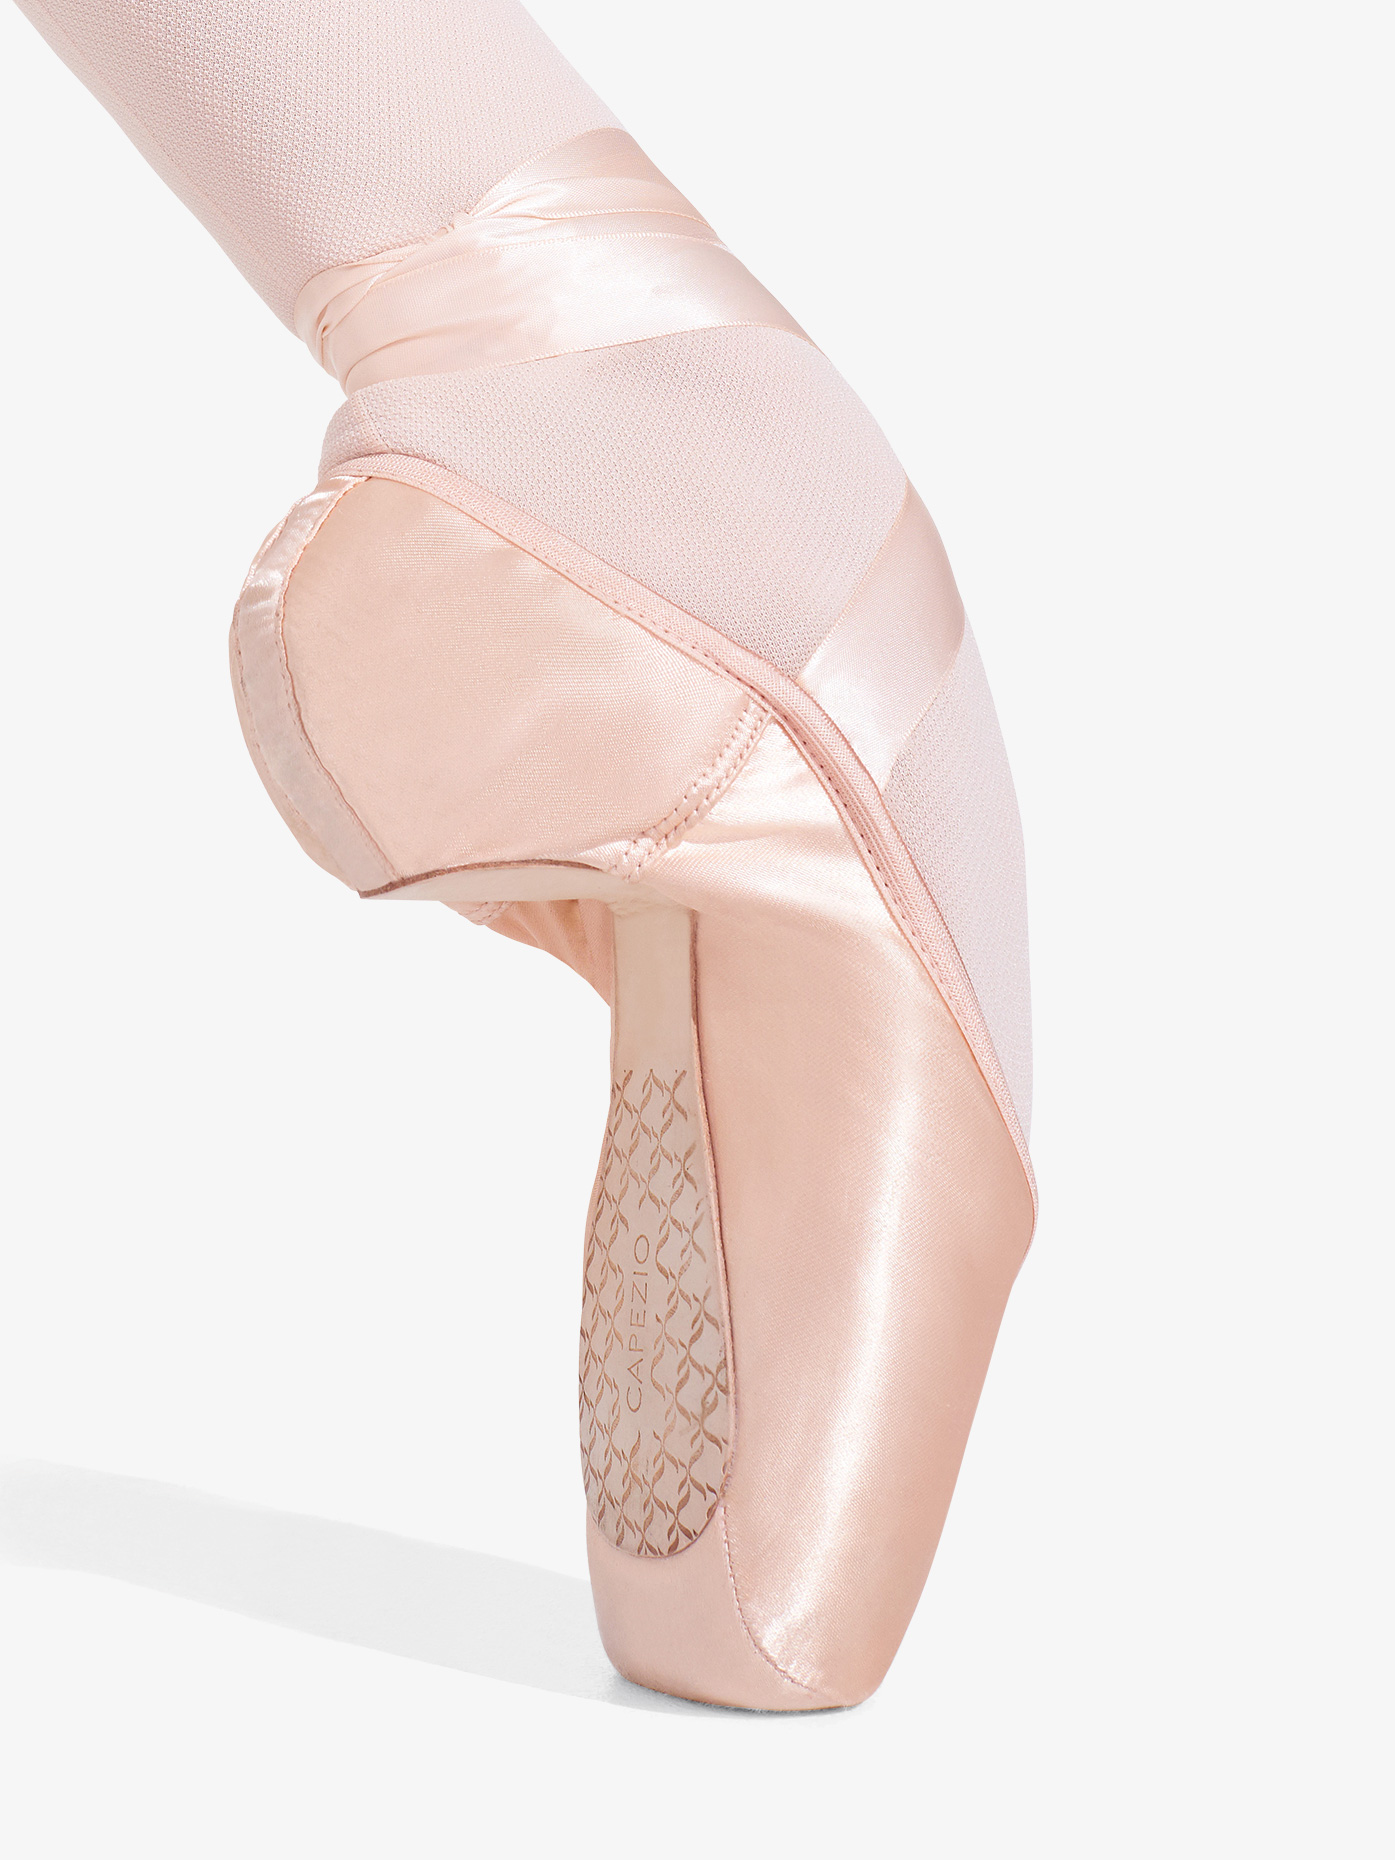 Capezio Womens Cambre Tapered Toe #3 Shank Pointe Shoes 1127W